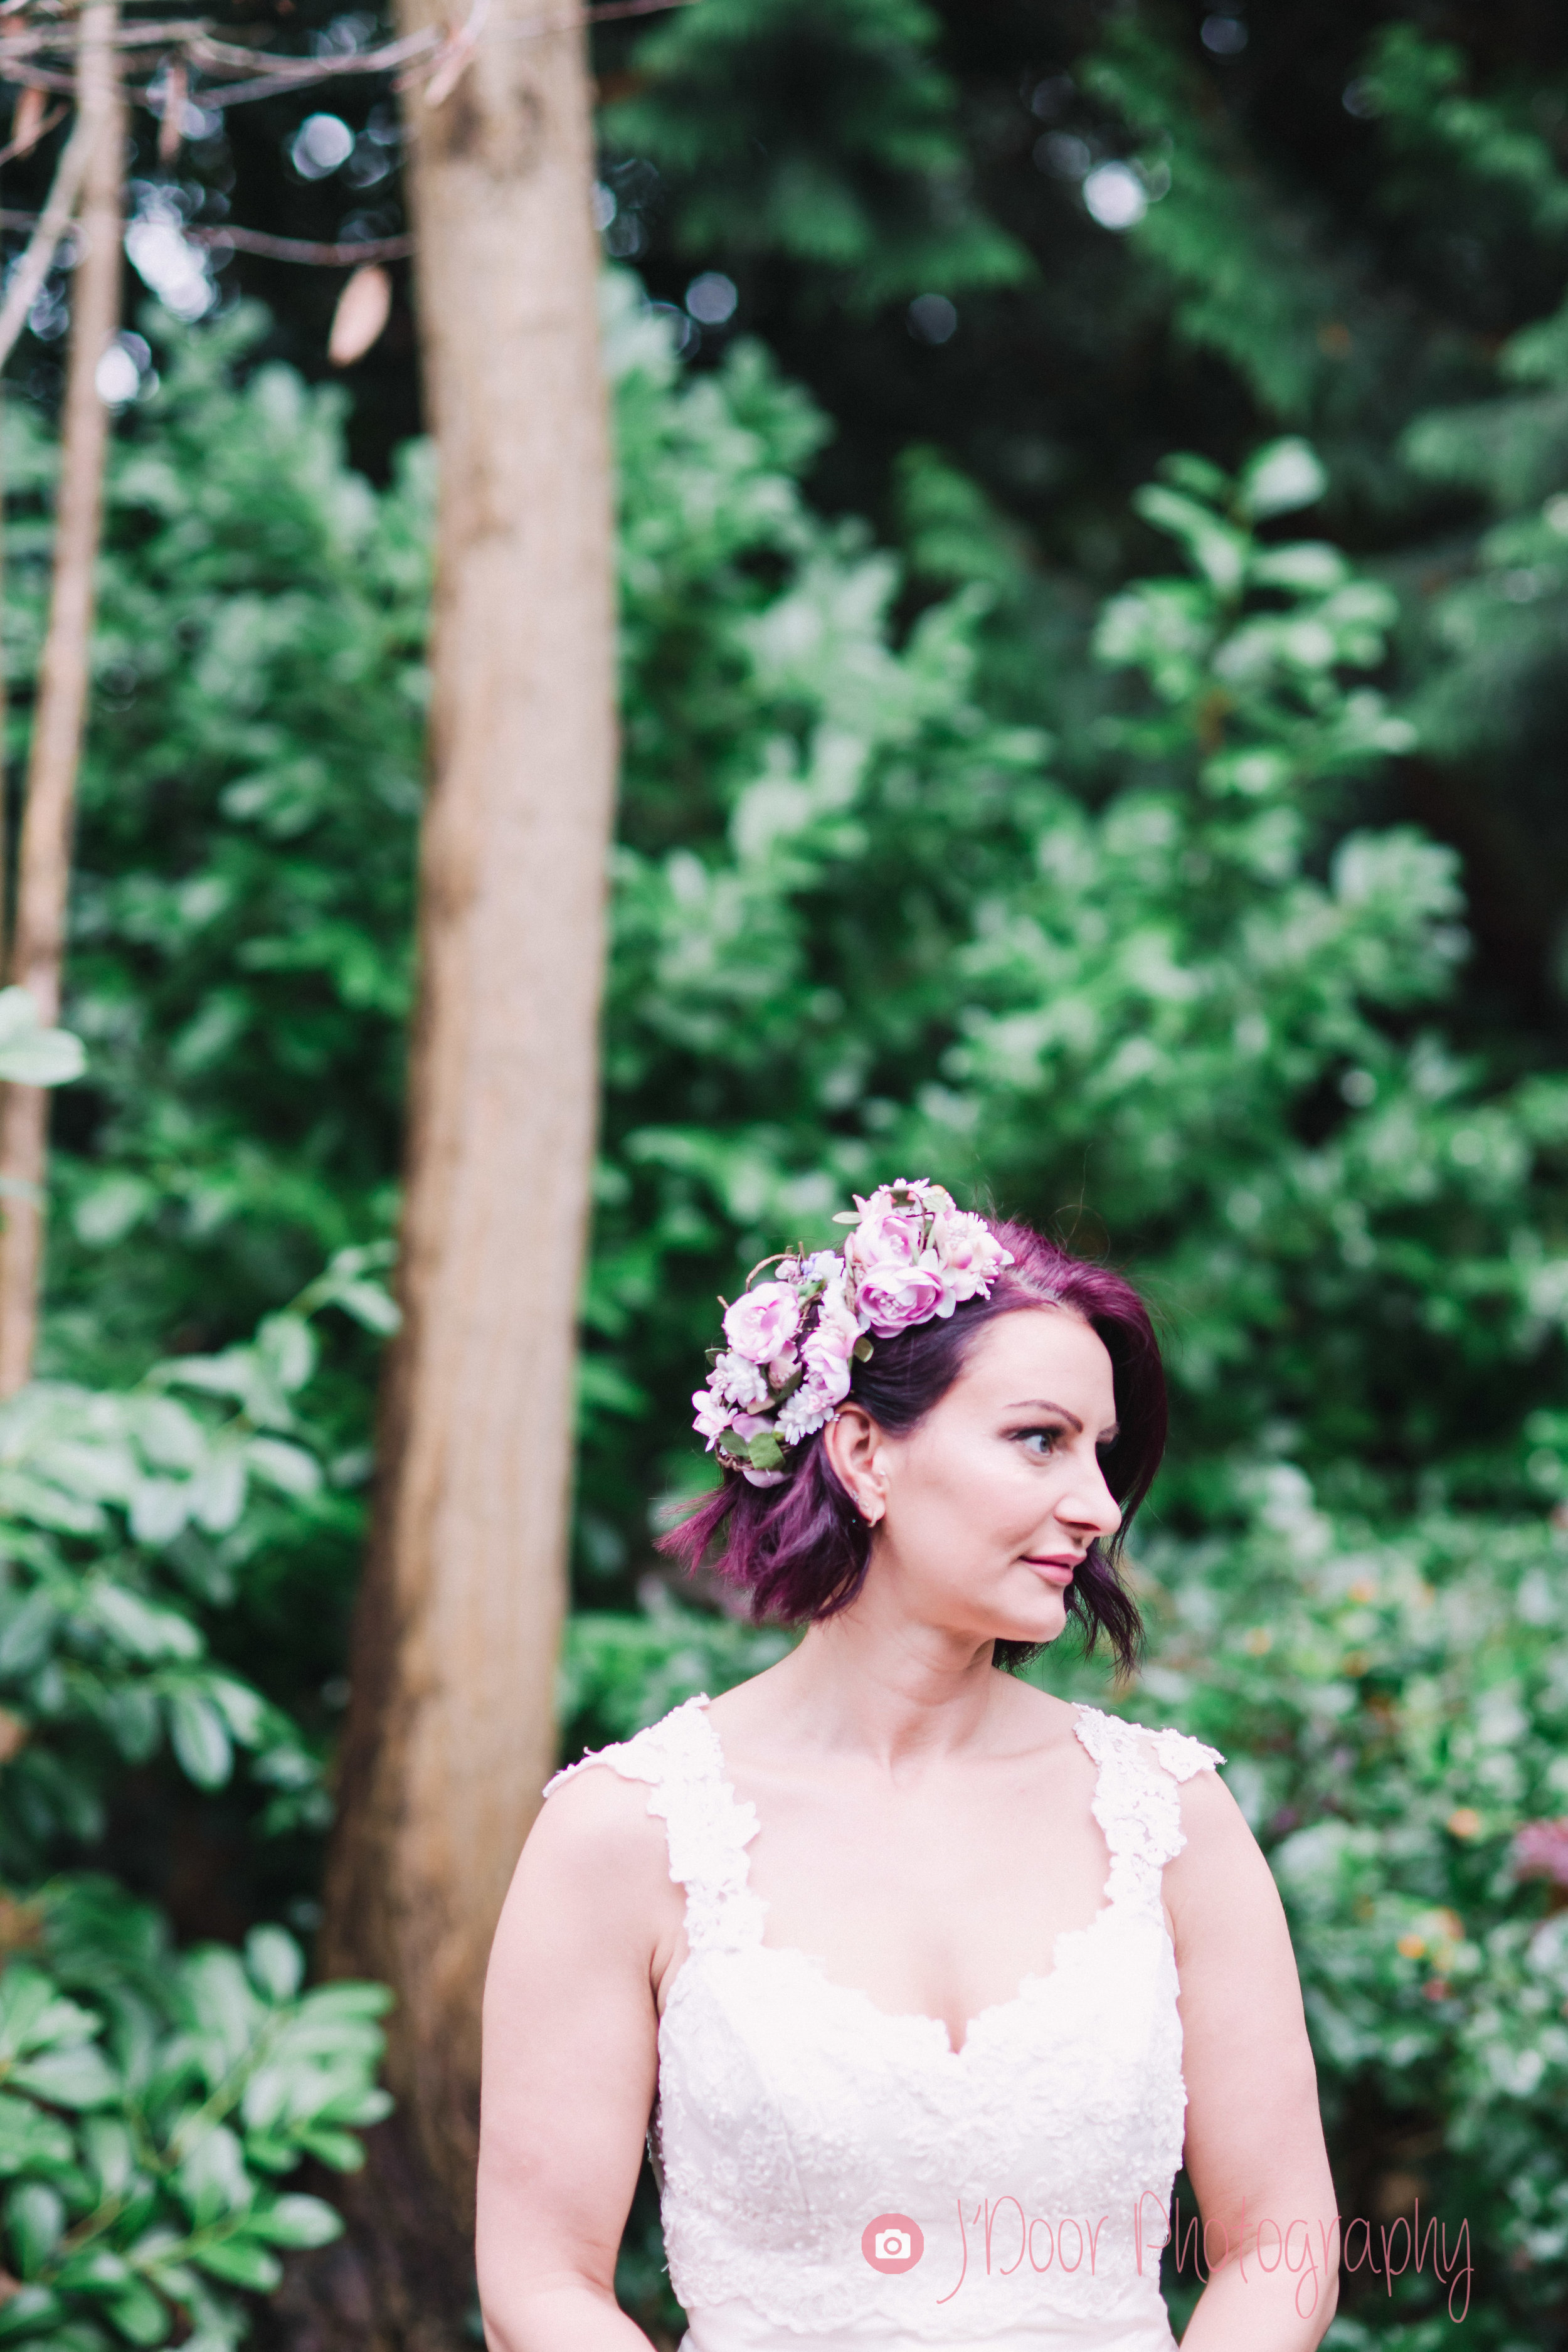 Makeup by Mel at Mel Miller Makeup, Hair by Emma J Hair Styling, Flowers by Louisa Jane, Model Vicki